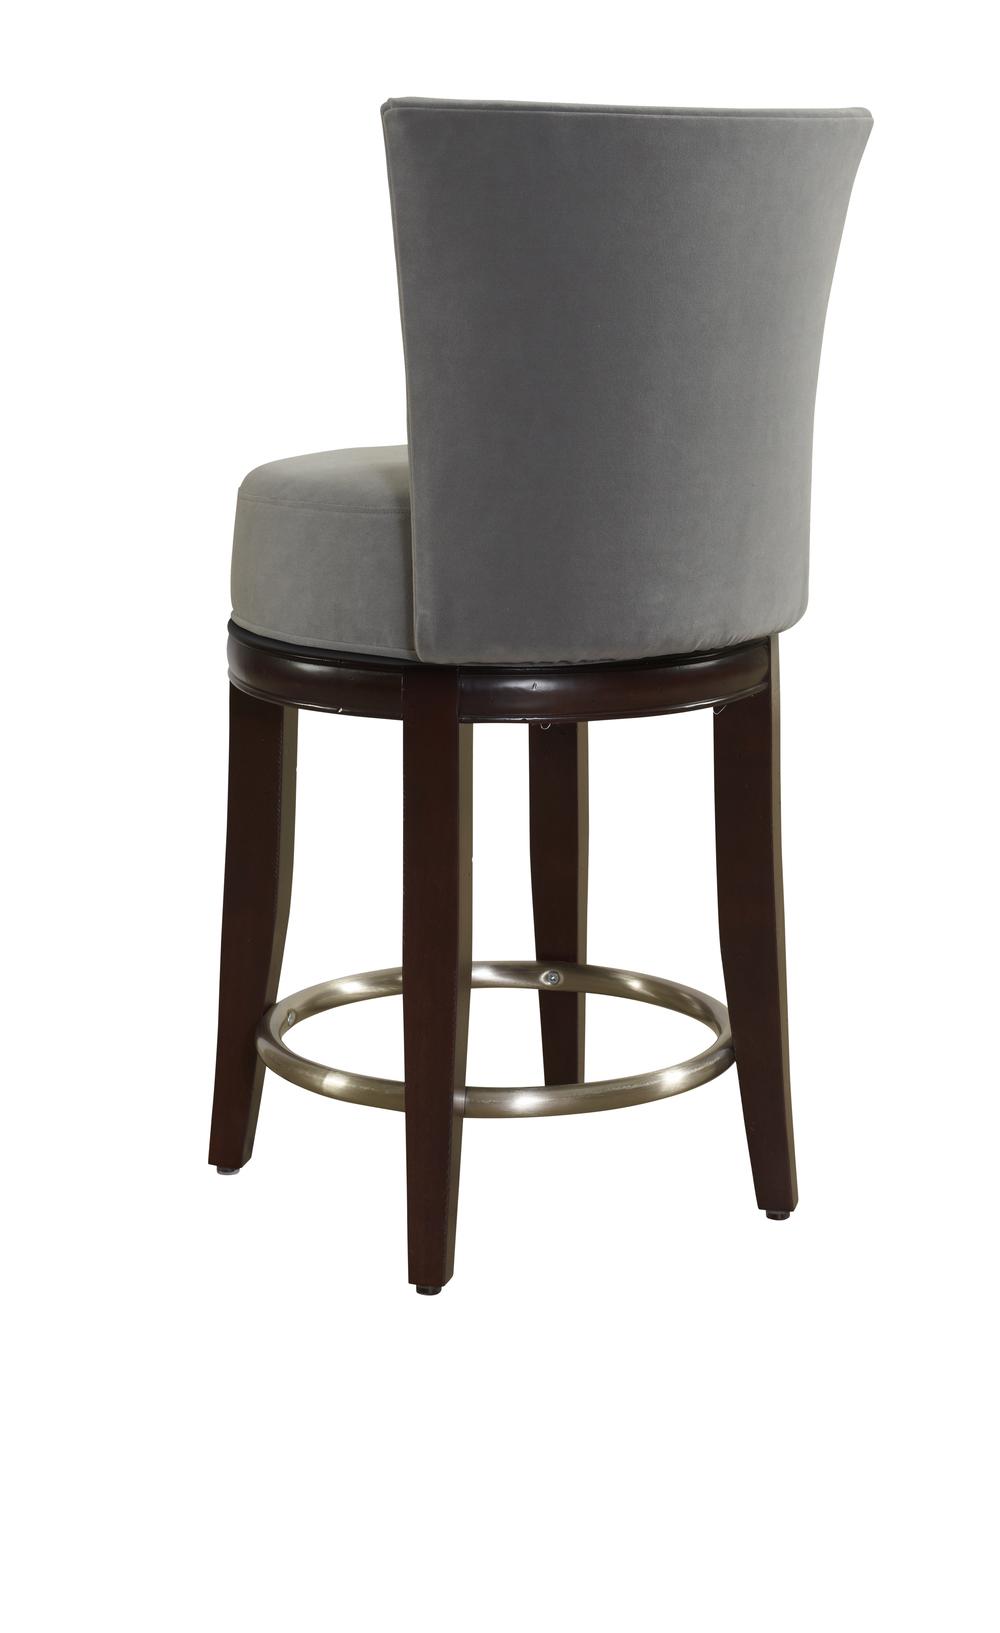 Designmaster Furniture - Danbury Counter Stool